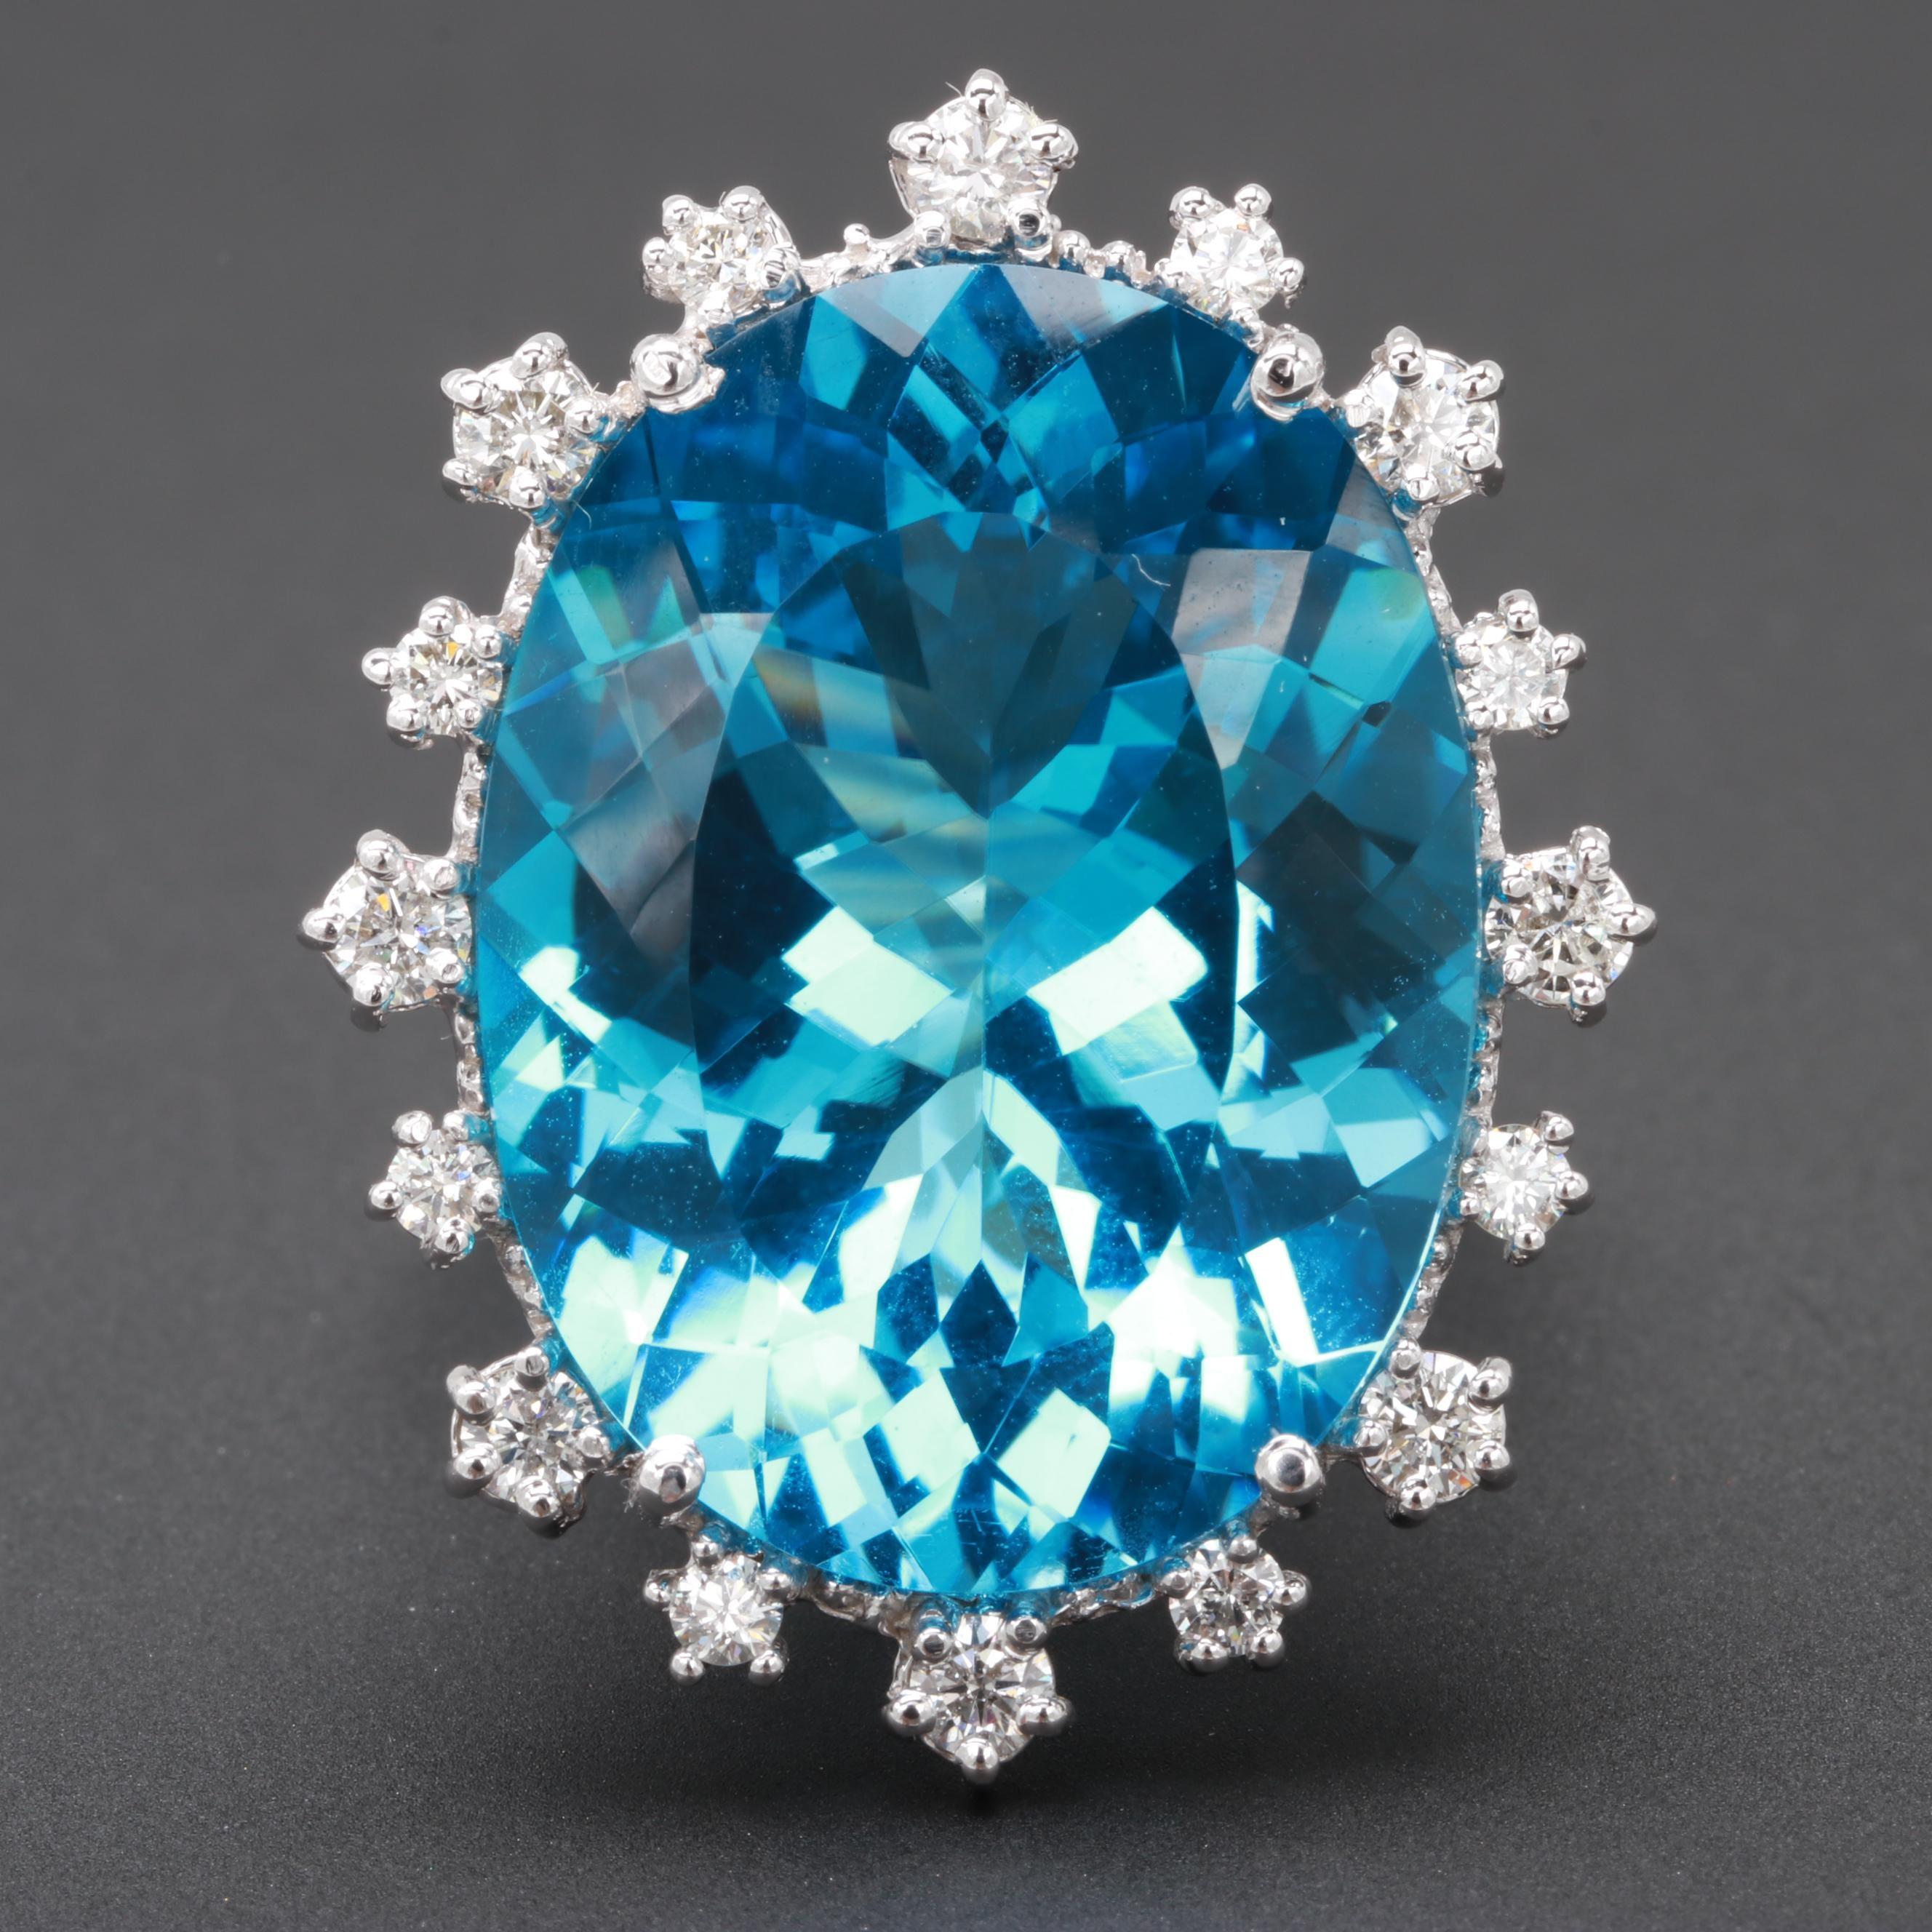 14K White Gold 30.27 CT Blue Topaz and Diamond Ring